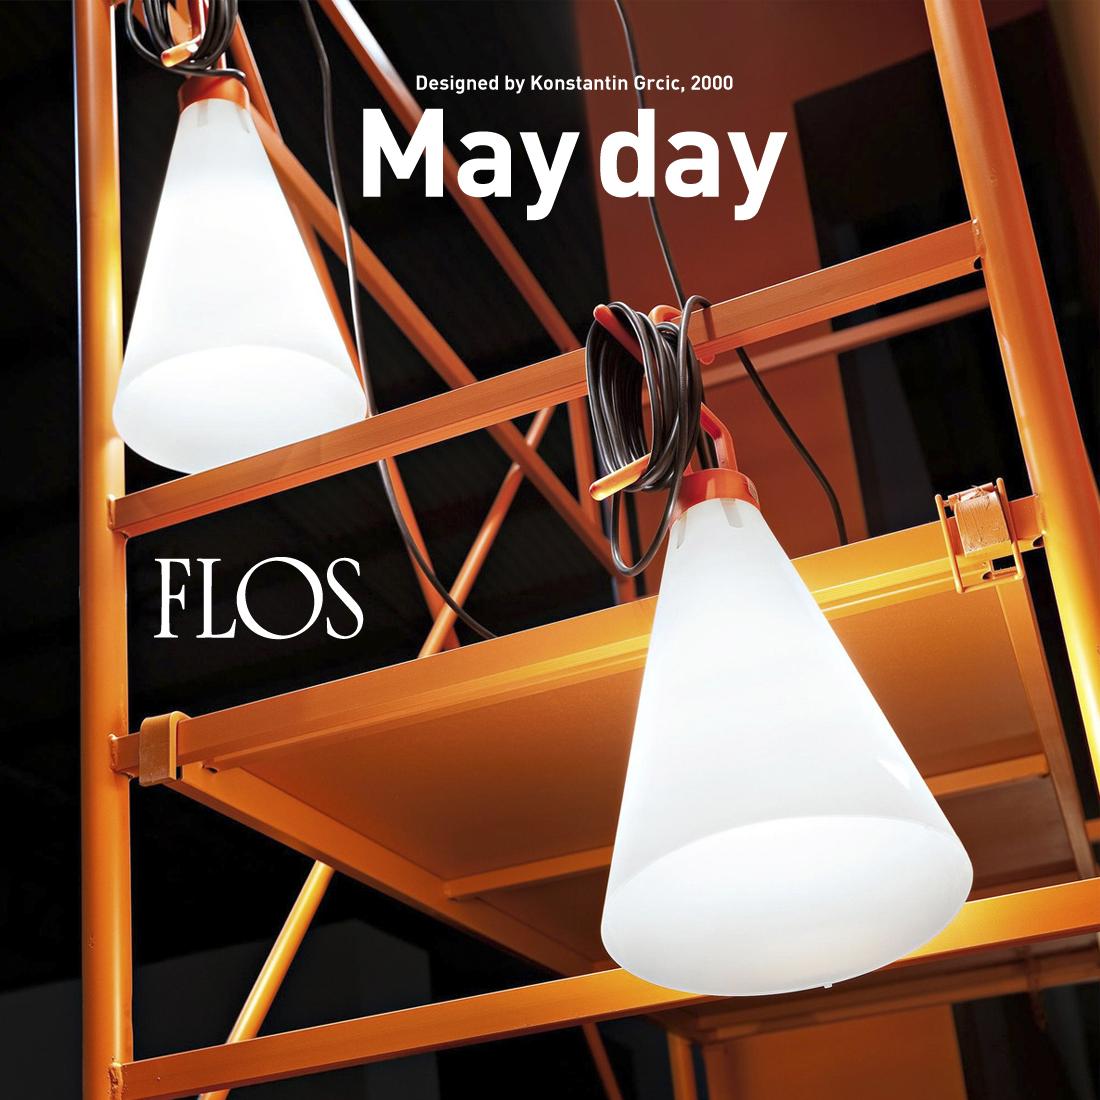 【FLOS 照明 フロス day】 May day メイデイ【FLOS ランプ Konstantin Grcic コンスタンティン・グルチッチ ライト 照明 デザイナーズ スタンド ペンダント テーブル メーデー, ボウリングショップ ANAN:df71902b --- sunward.msk.ru